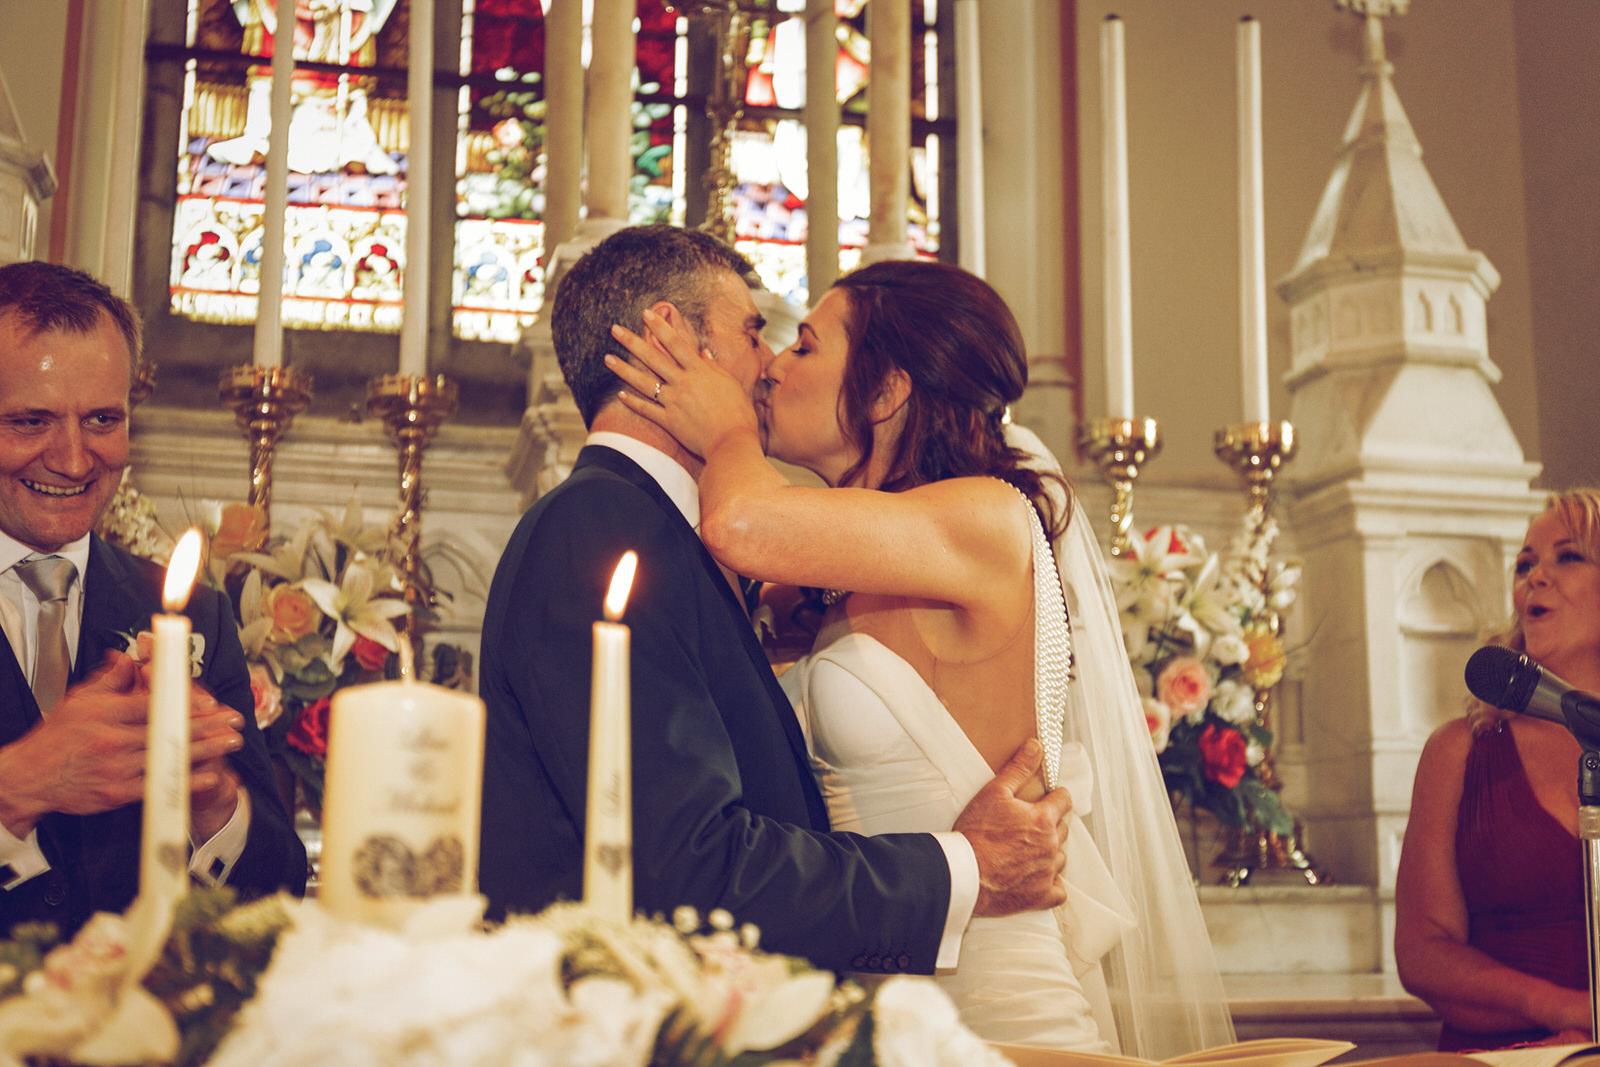 Brooklodge-wicklow-wedding-photographer_037.jpg